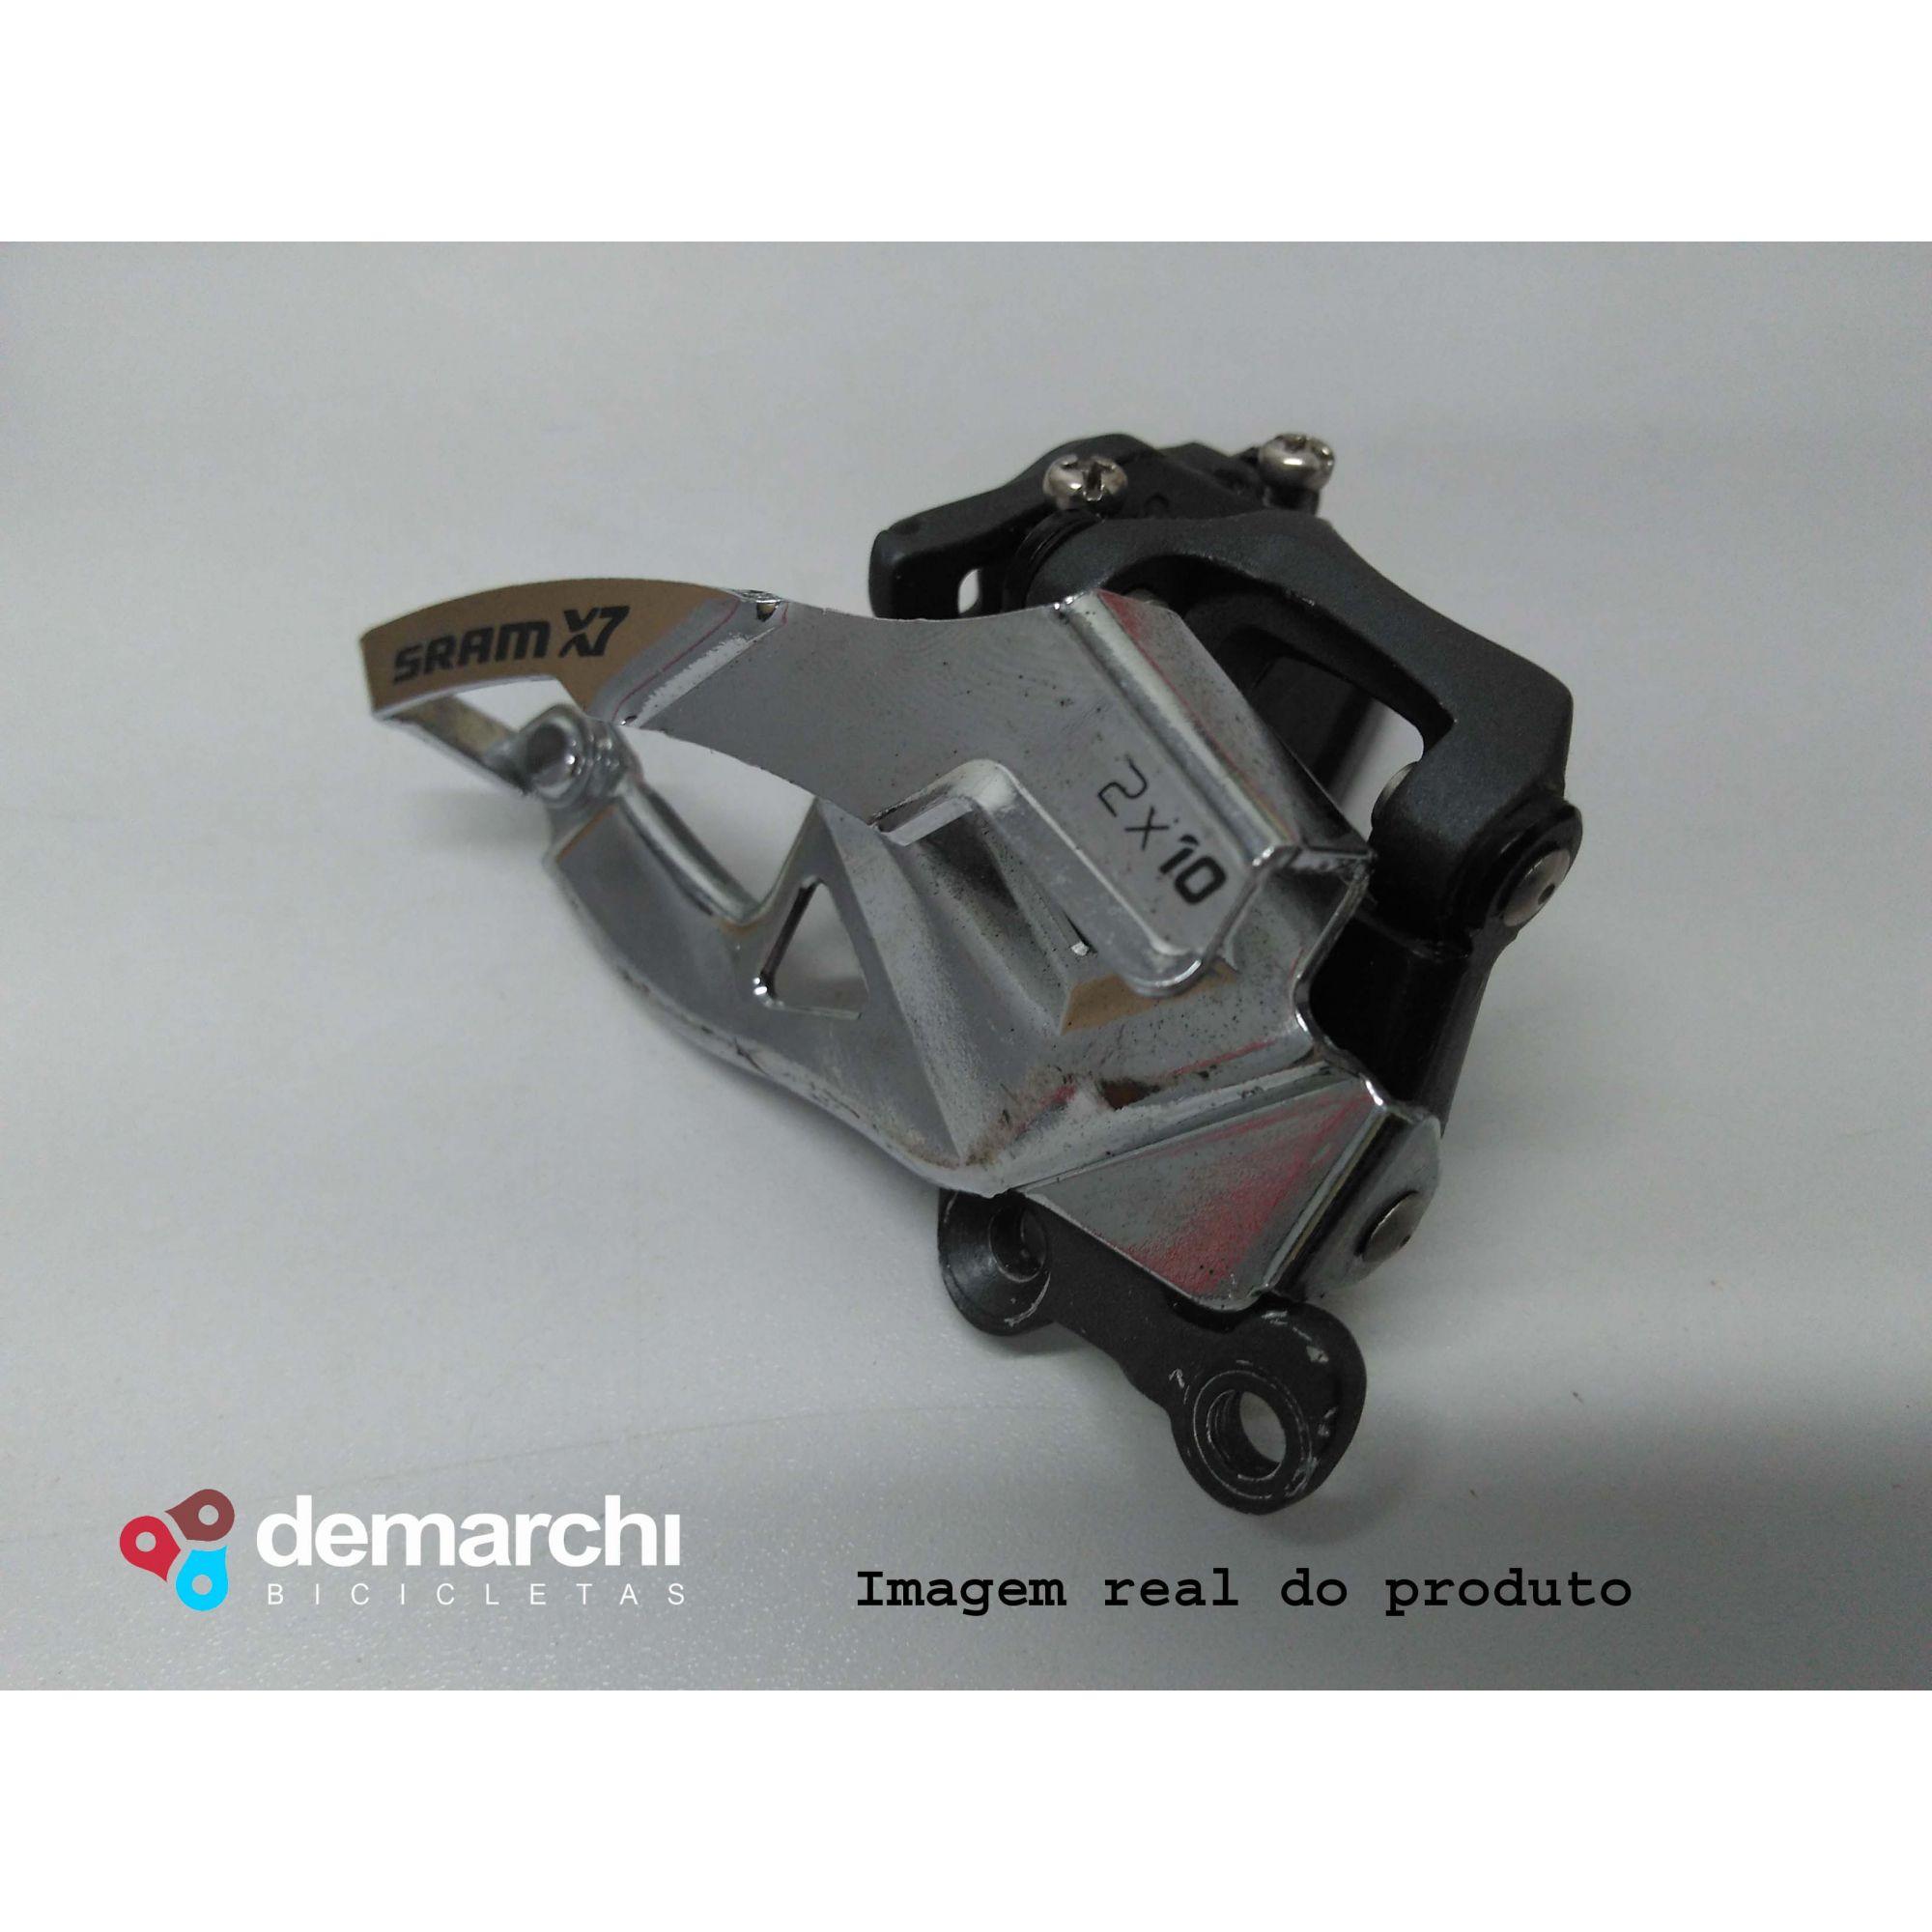 CÂMBIO DIANTEIRO SRAM X7 2X10 DIRECT MOUNT DUAL PULL(Semi-Novo)